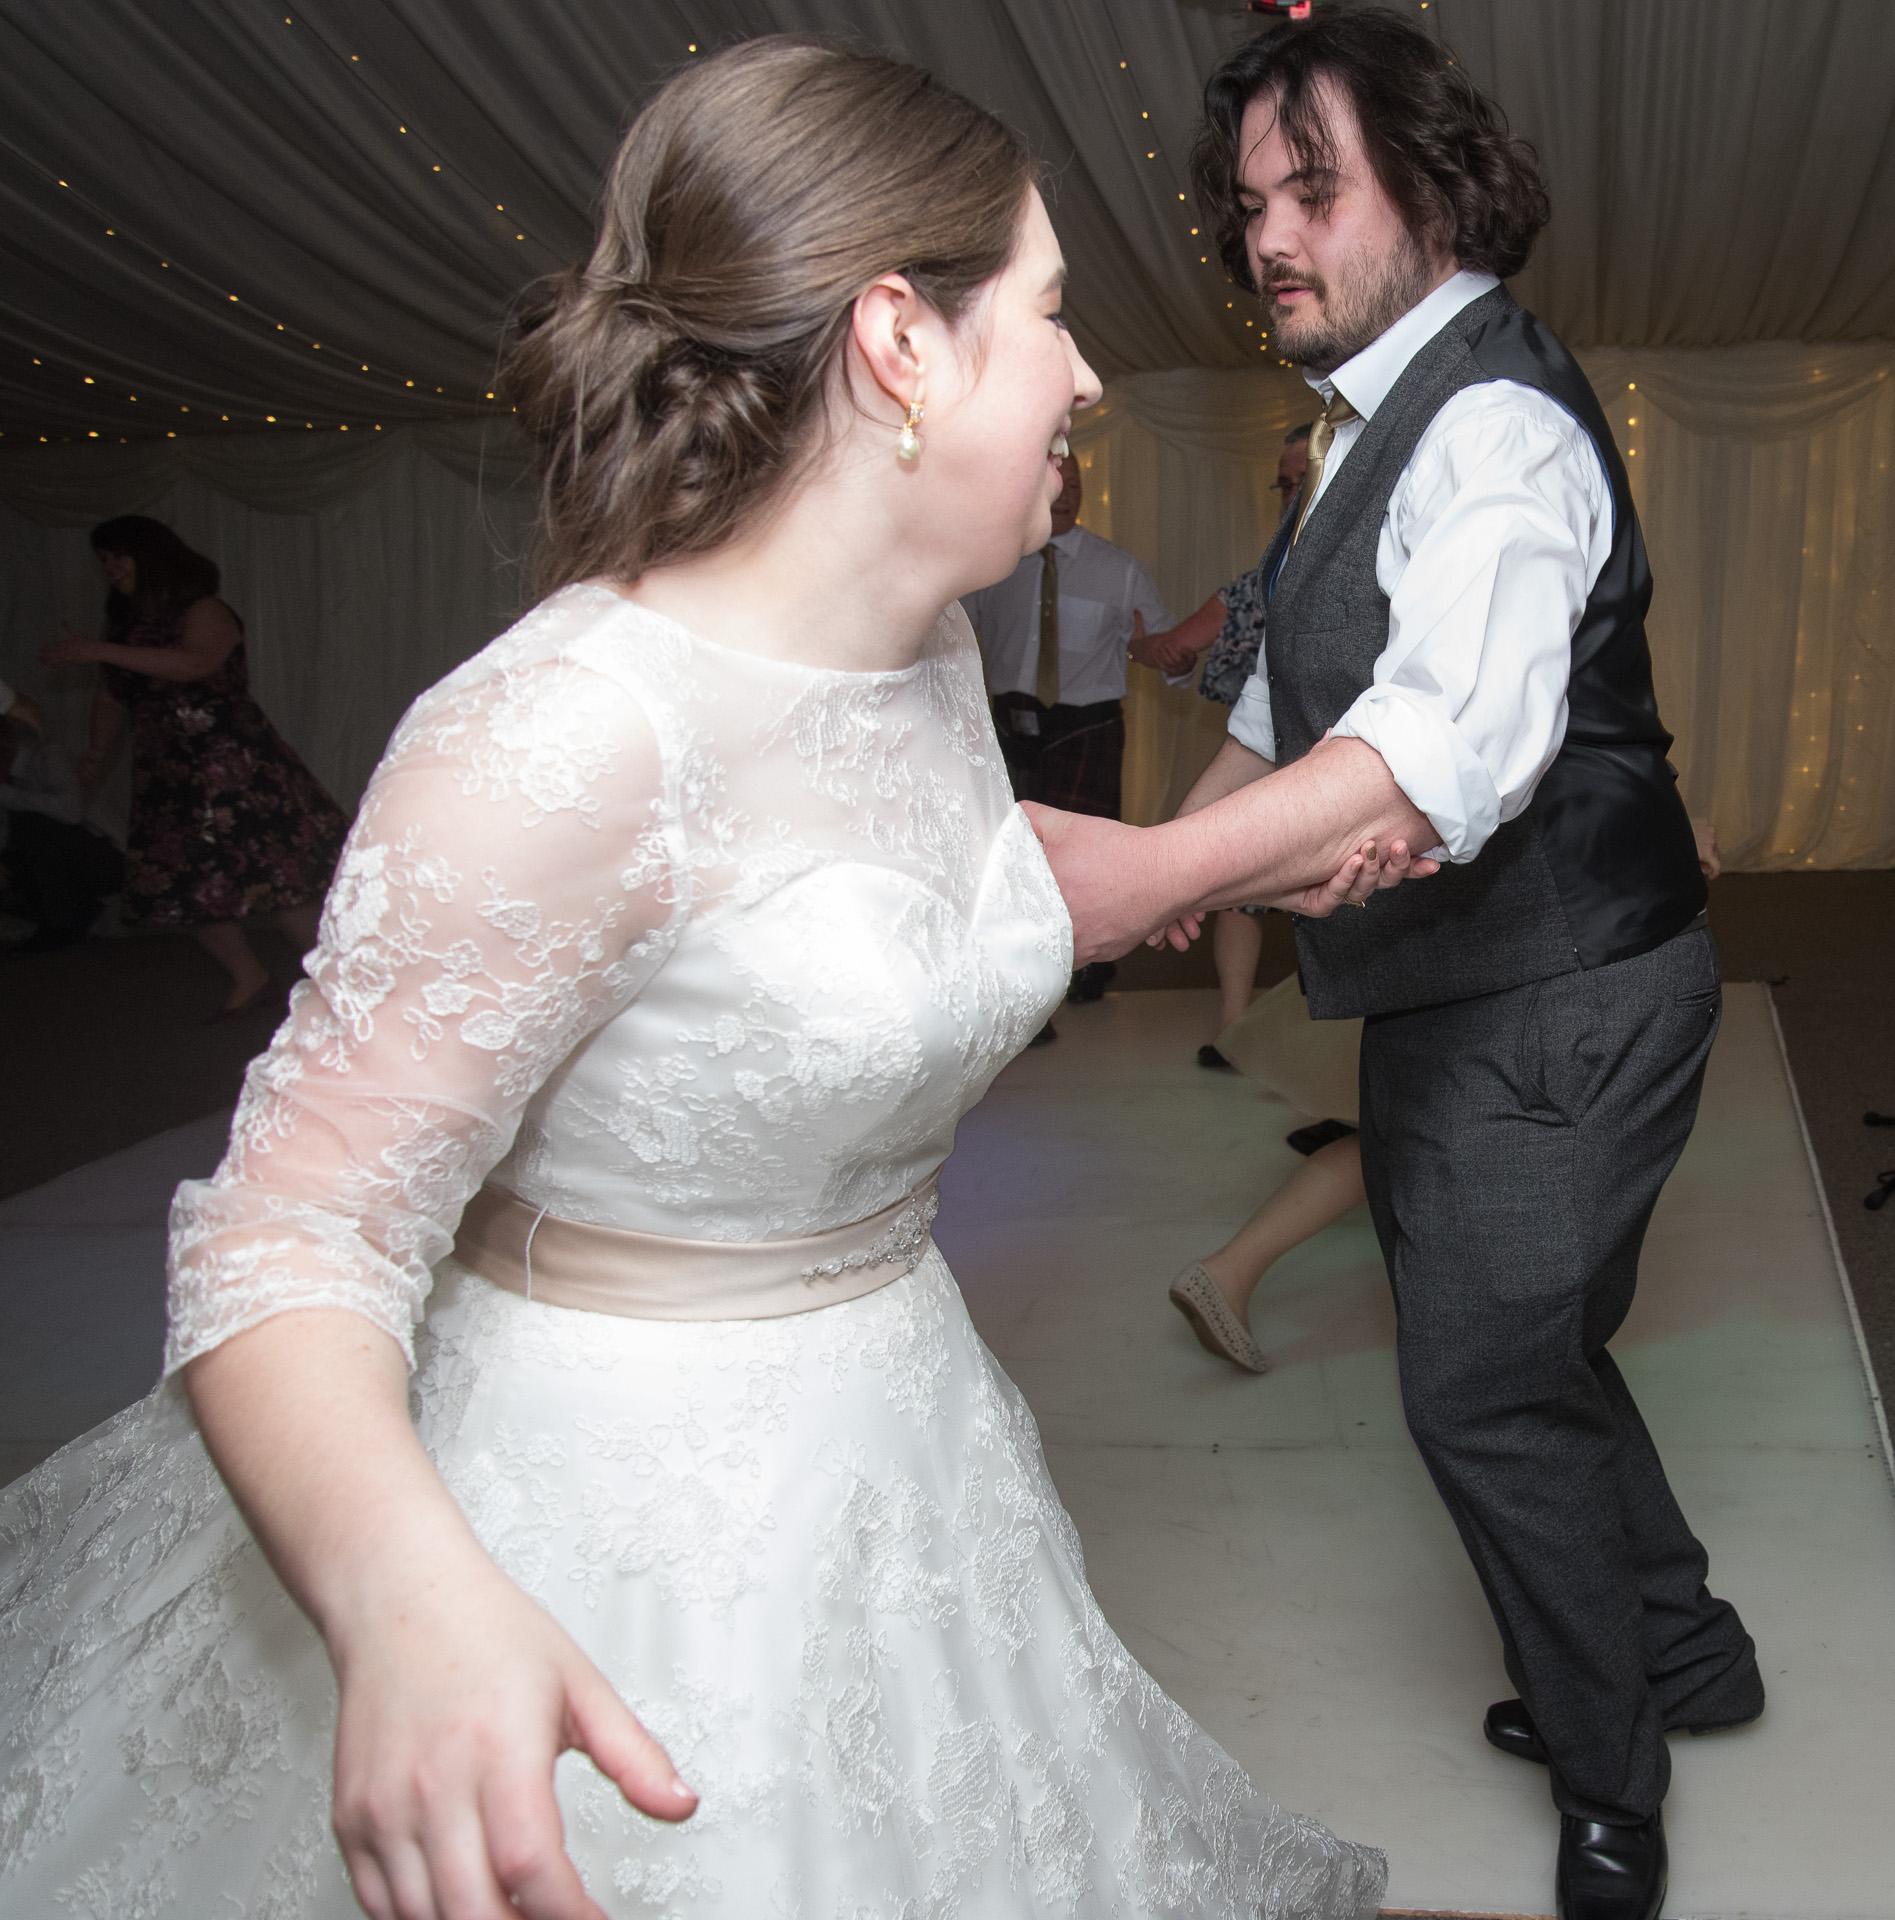 wedding couple dancing at reception